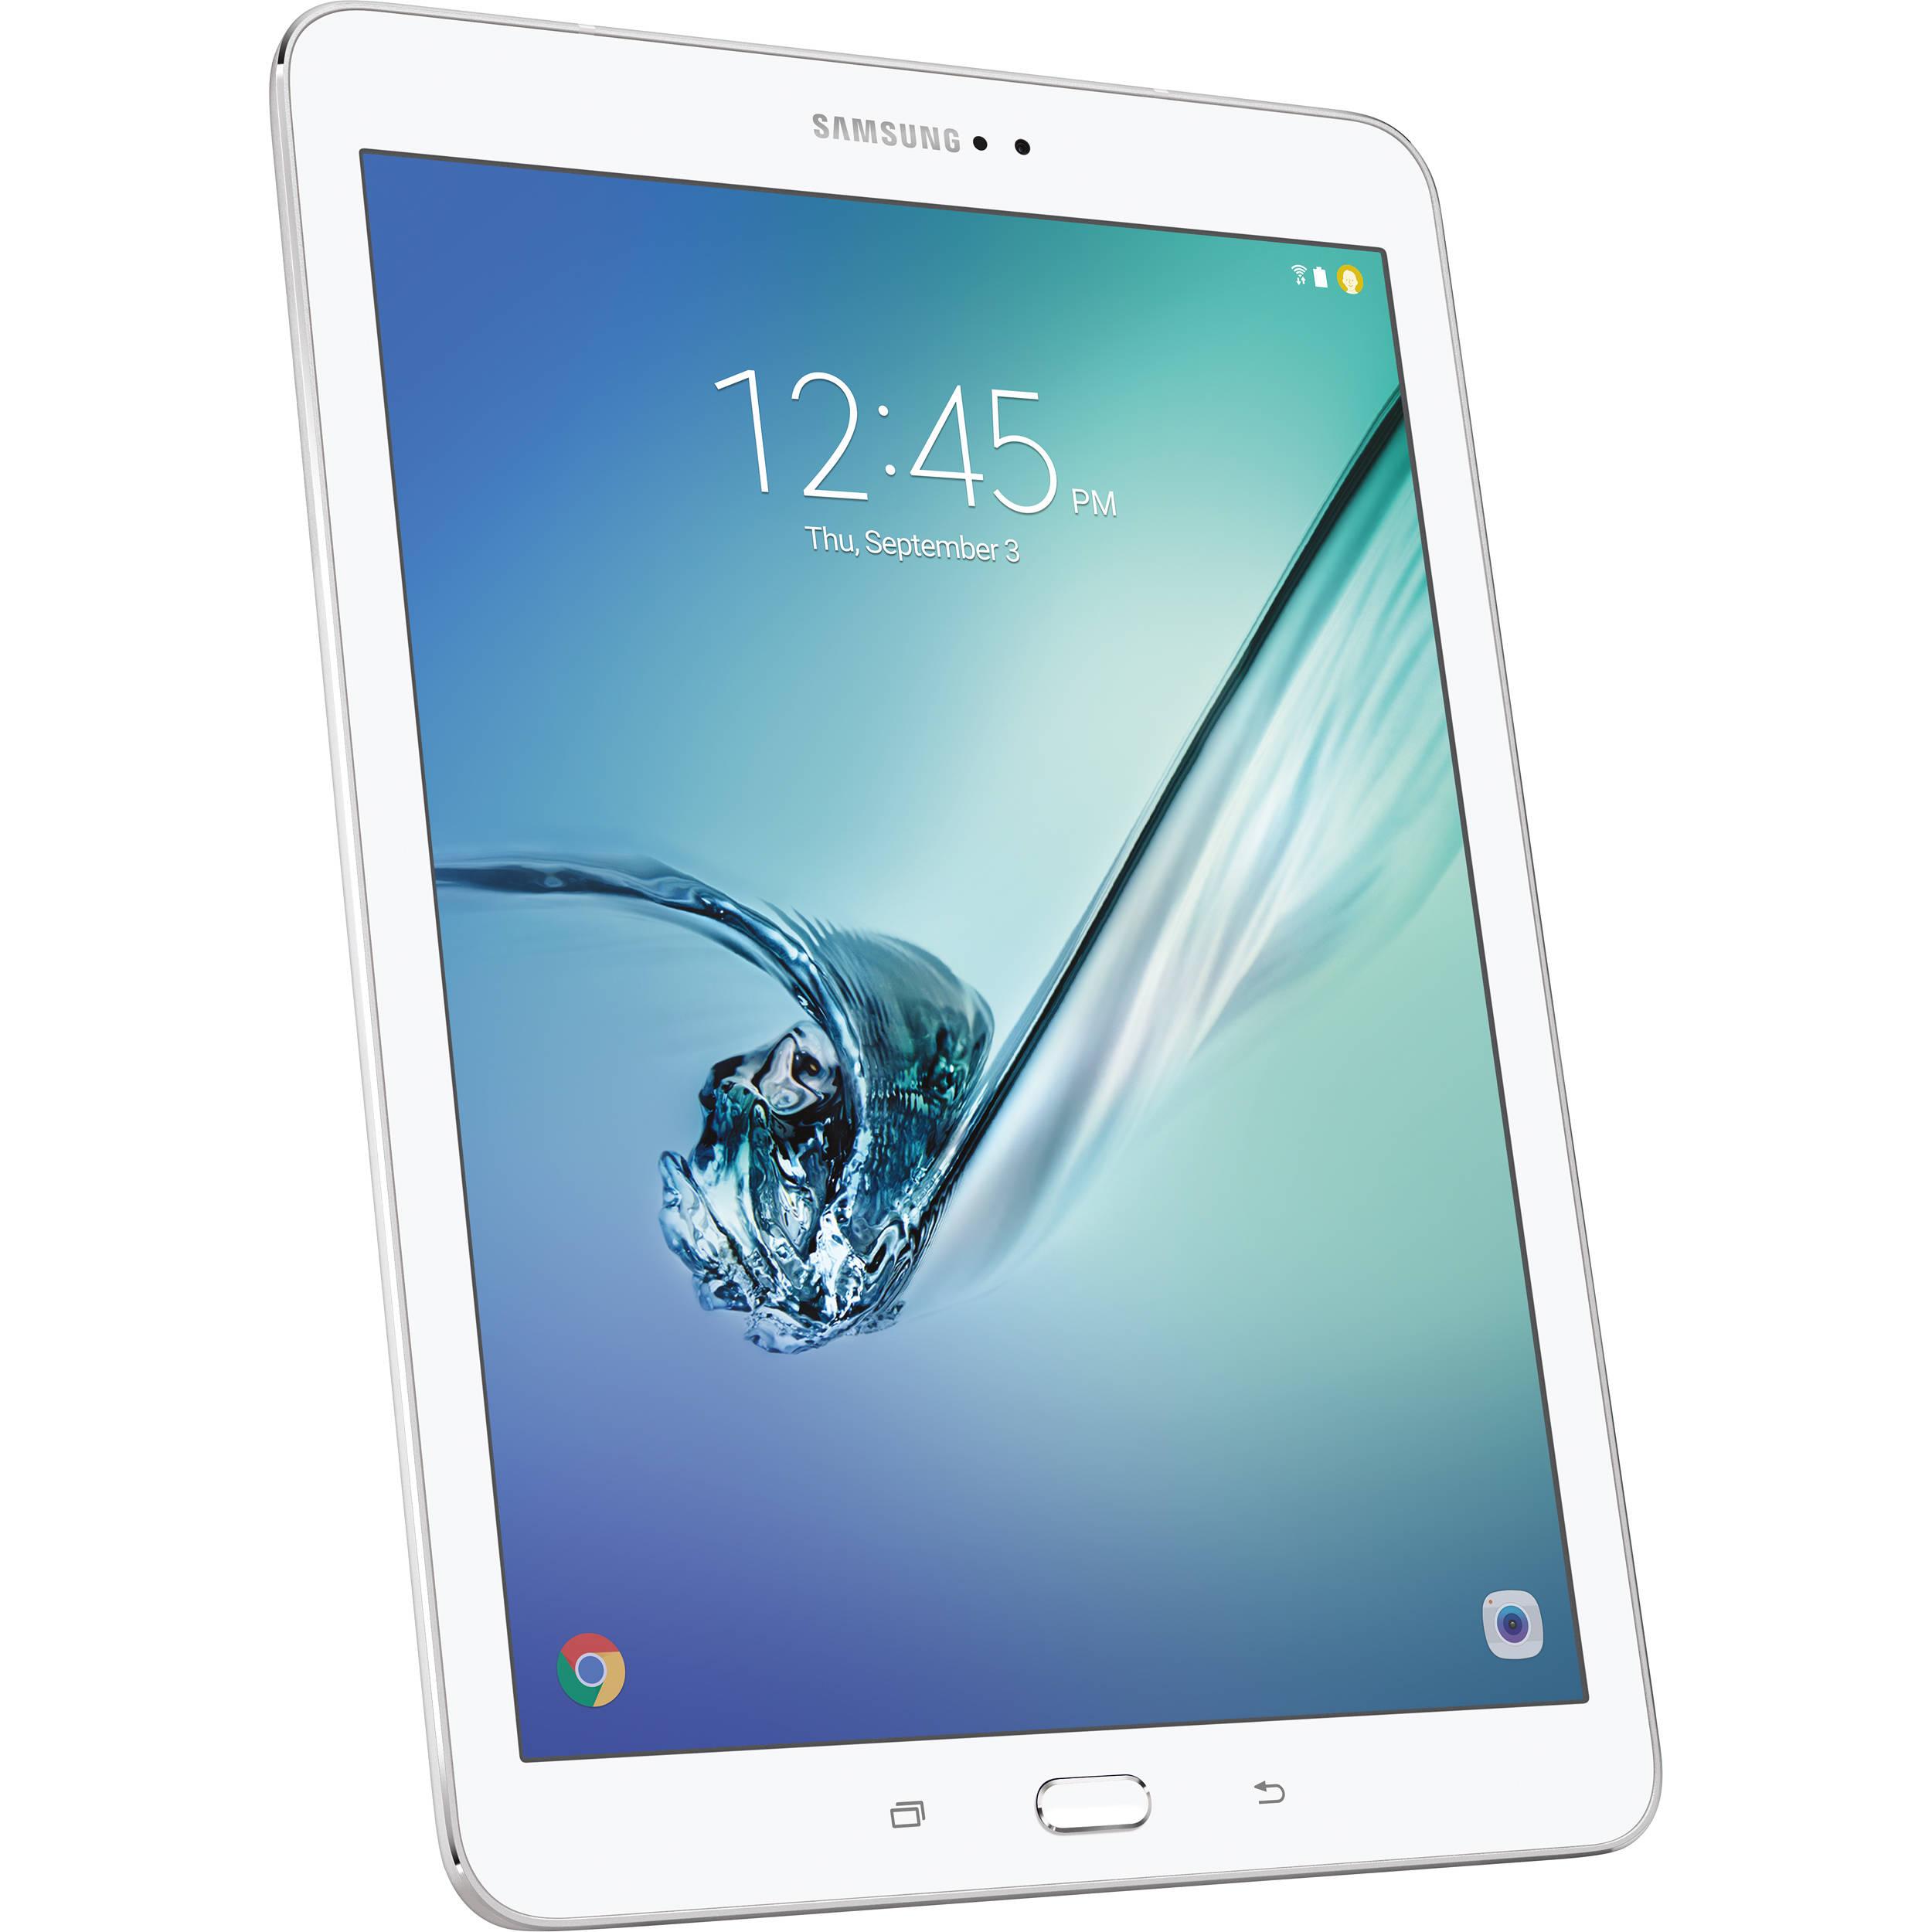 samsung 32gb galaxy tab s2 9 7 wi fi tablet sm t813nzwexar. Black Bedroom Furniture Sets. Home Design Ideas